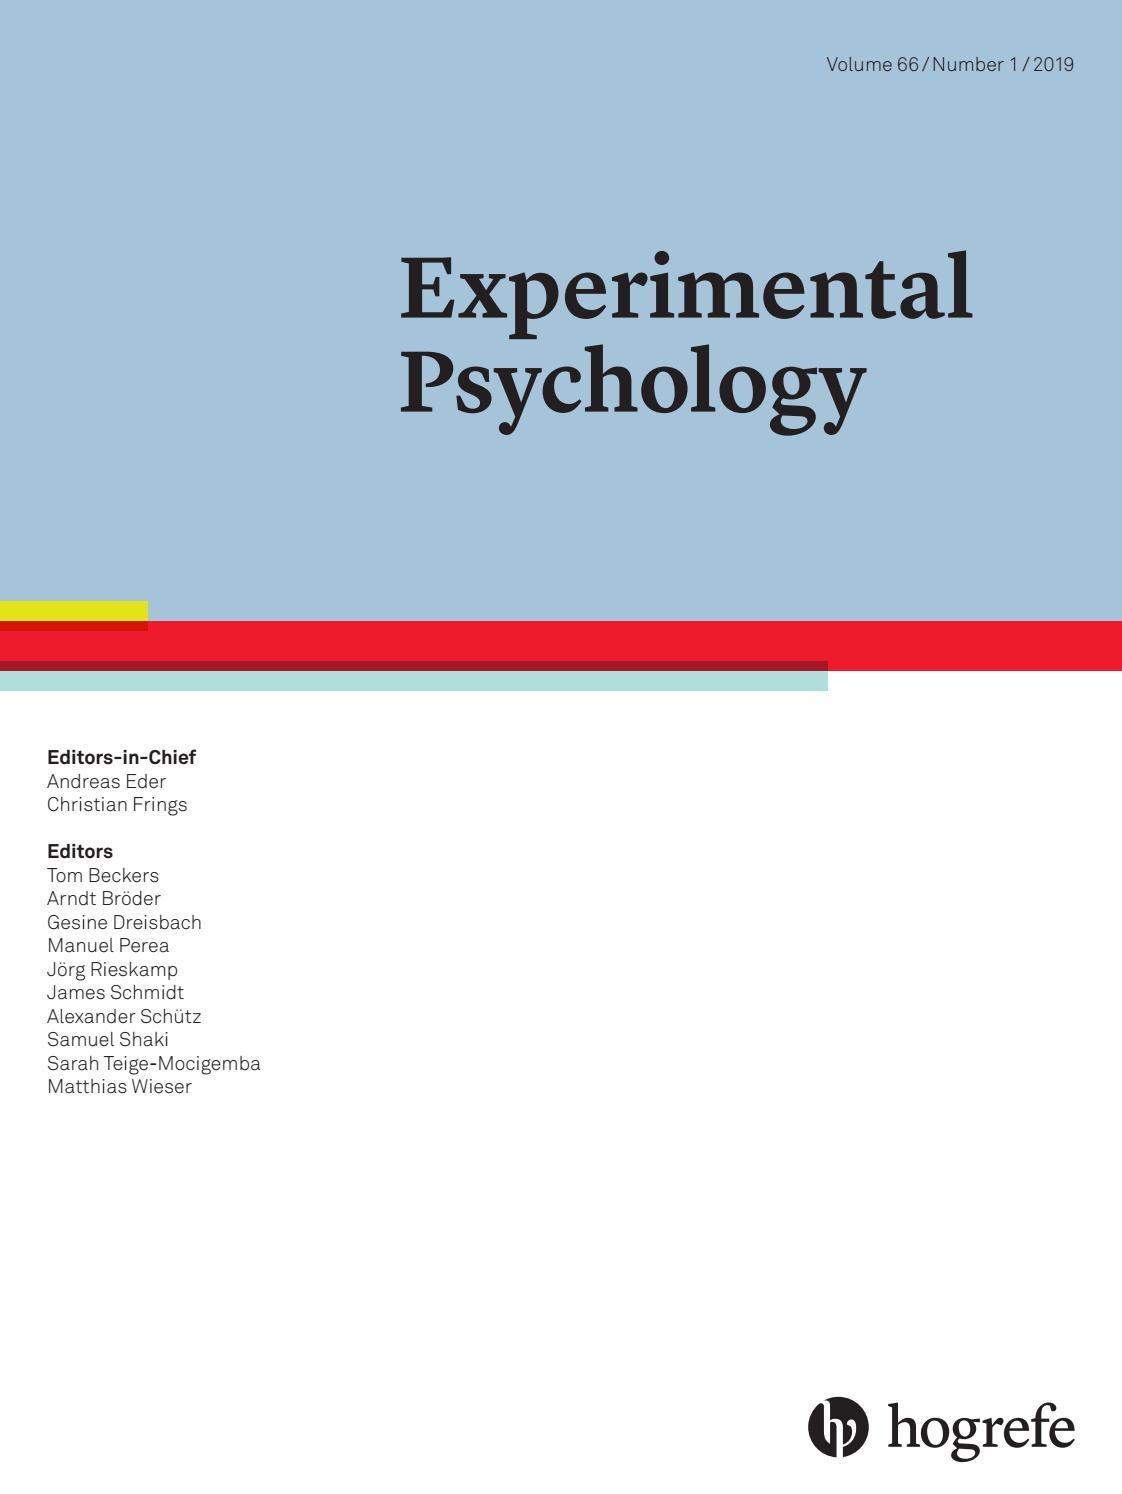 Experimental Psychology By Hogrefe Issuu